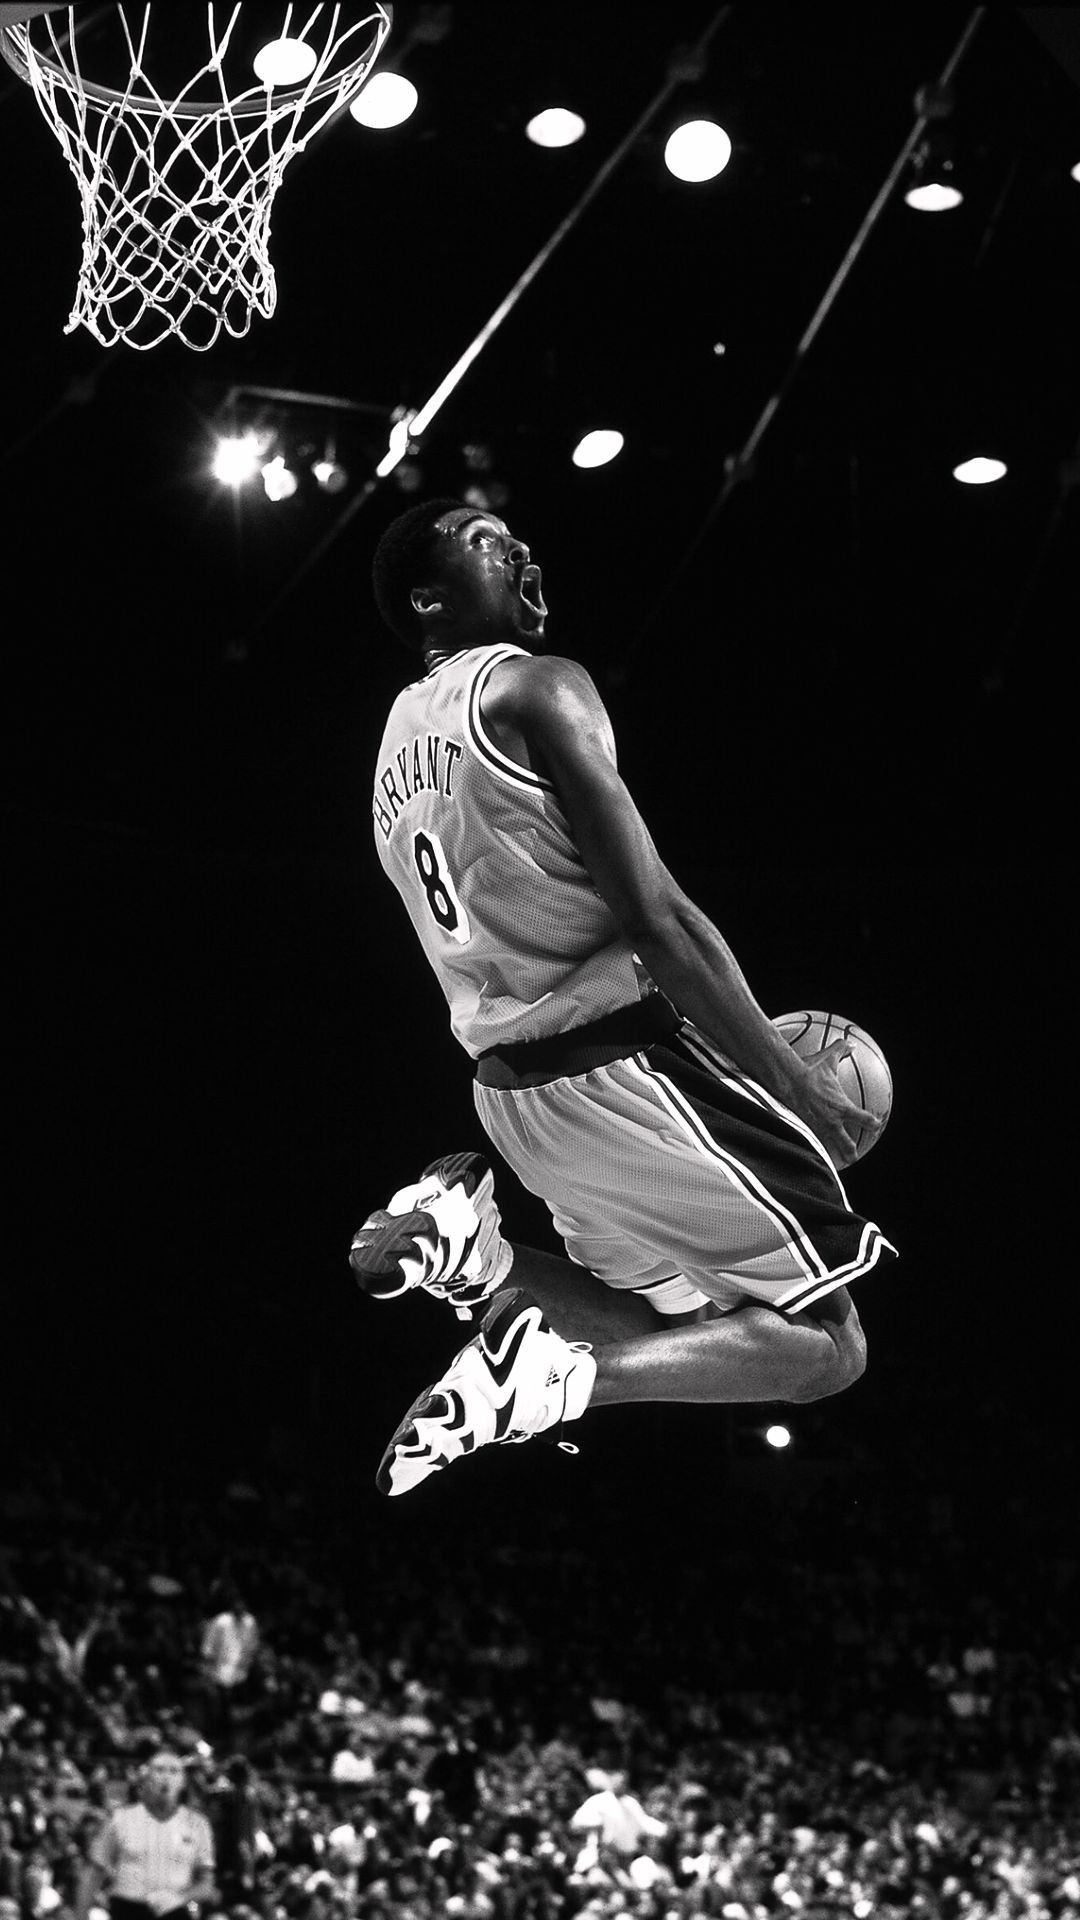 Kobe Bryant Wallpaper Black And White : bryant, wallpaper, black, white, Bryant, Basketball, Wallpaper, Pictures,, Wallpaper,, Michael, Jordan